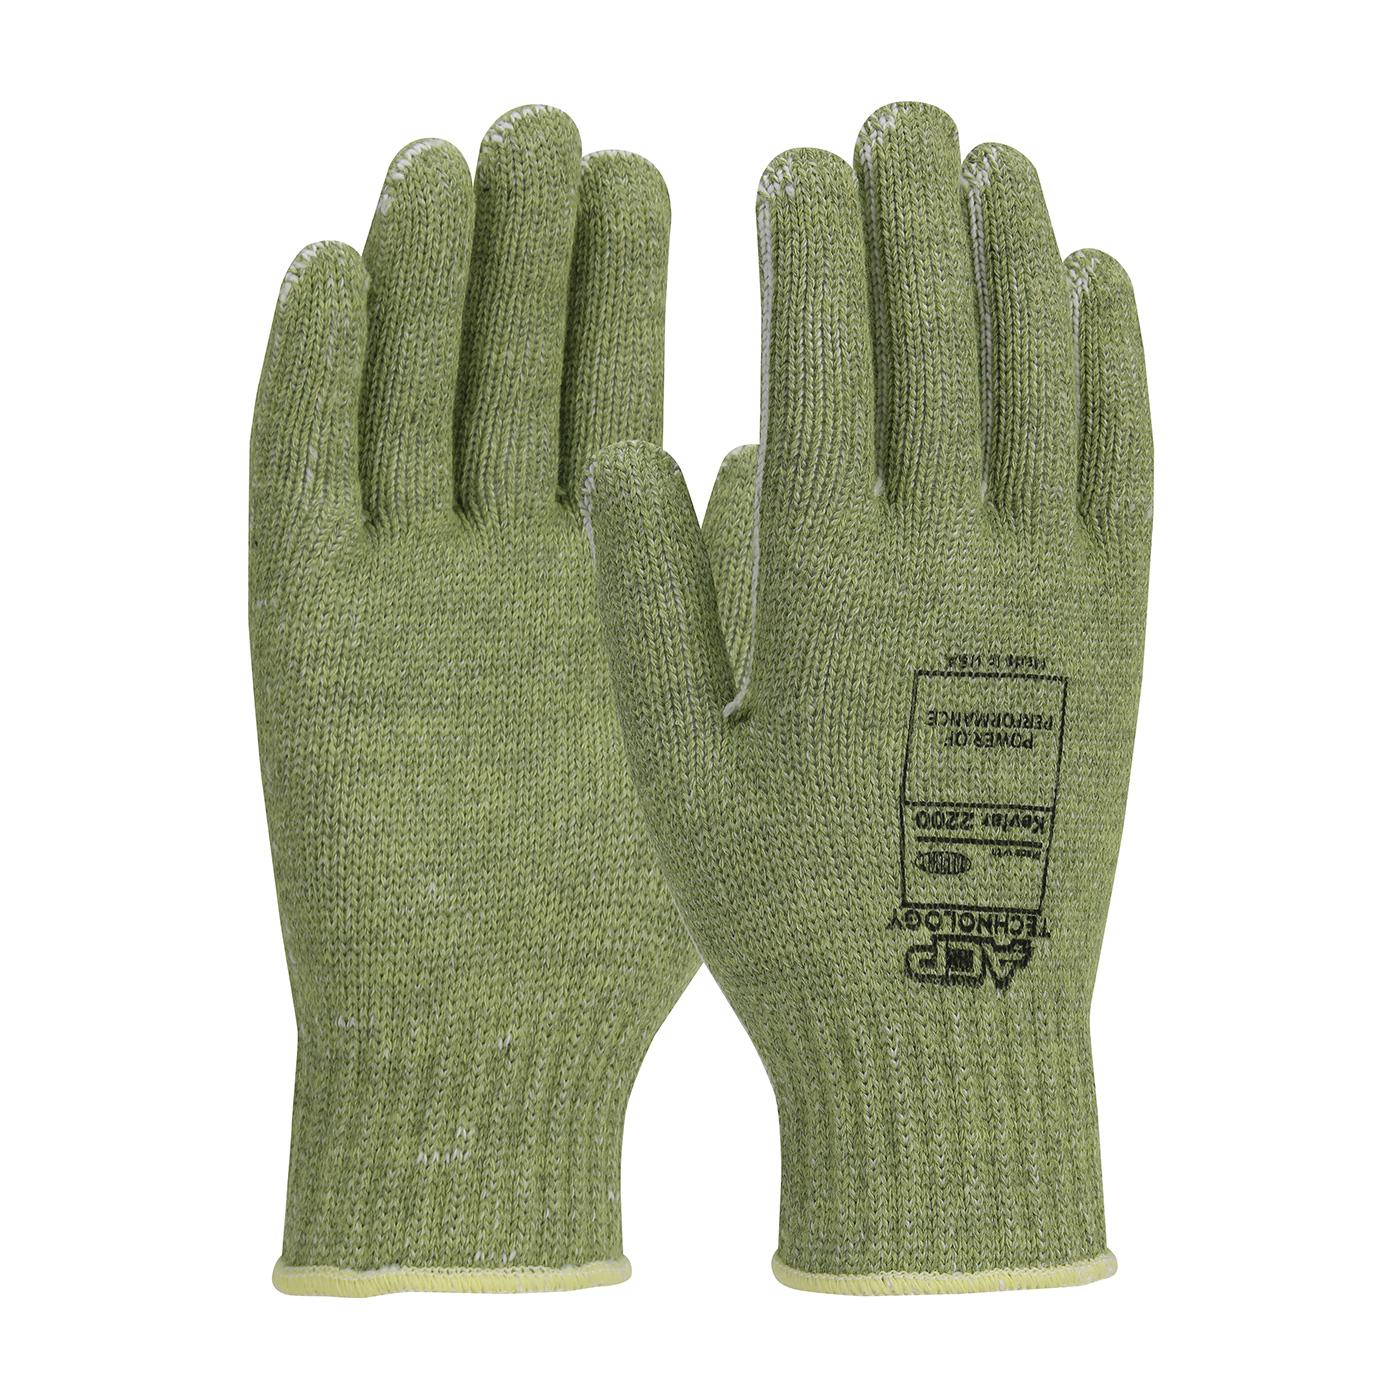 PIP® ACP Technology™ 07-KA720/L Medium Weight Unisex Cut Resistant Gloves, L, ACP/Kevlar®, Elastic/Knit Wrist Cuff, Resists: Abrasion, Cut, Fatigue and Heat, ANSI Cut-Resistance Level: A6